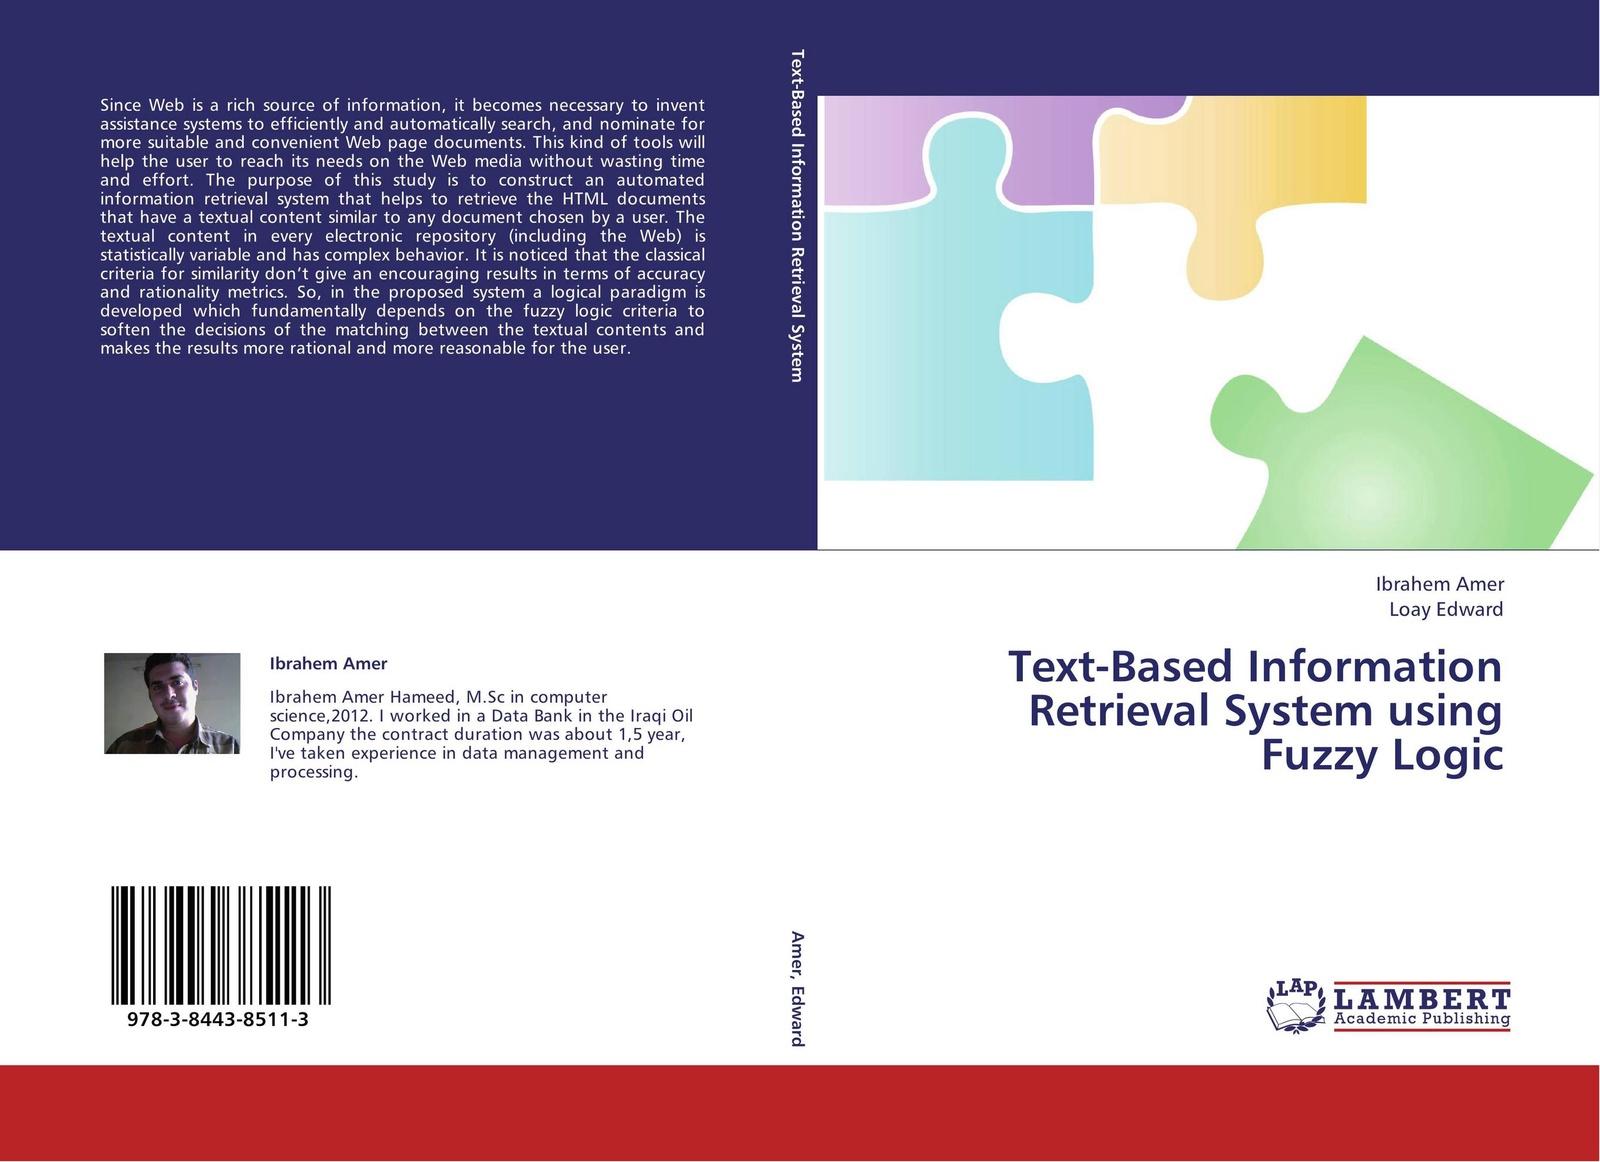 Ibrahem Amer and Loay Edward Text-Based Information Retrieval System using Fuzzy Logic christian sallaberry geographical information retrieval in textual corpora